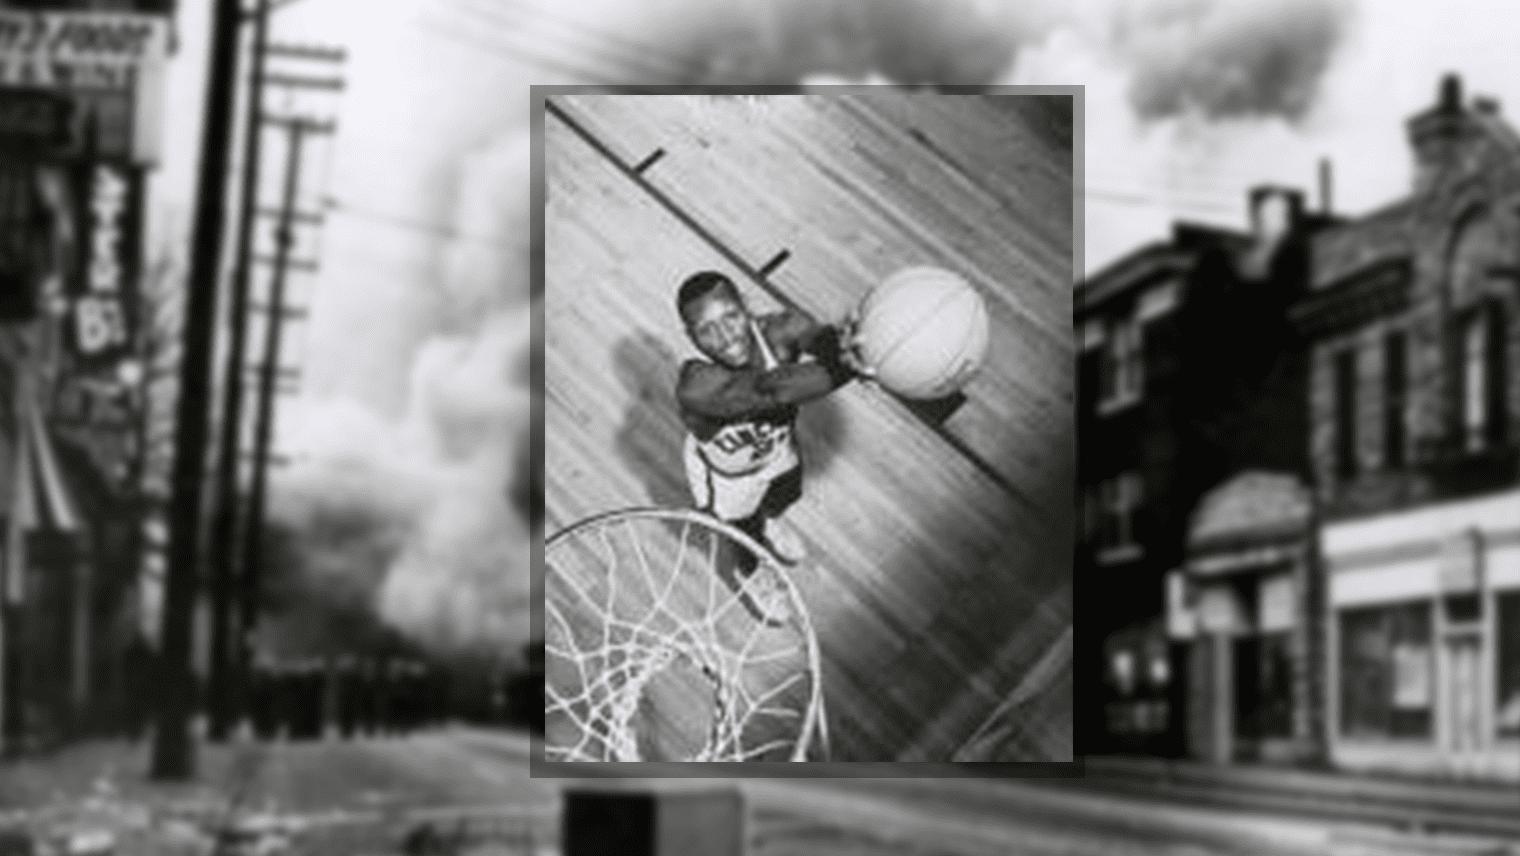 Dr. John Howard Let Convictions, Education Lead Basketball Career